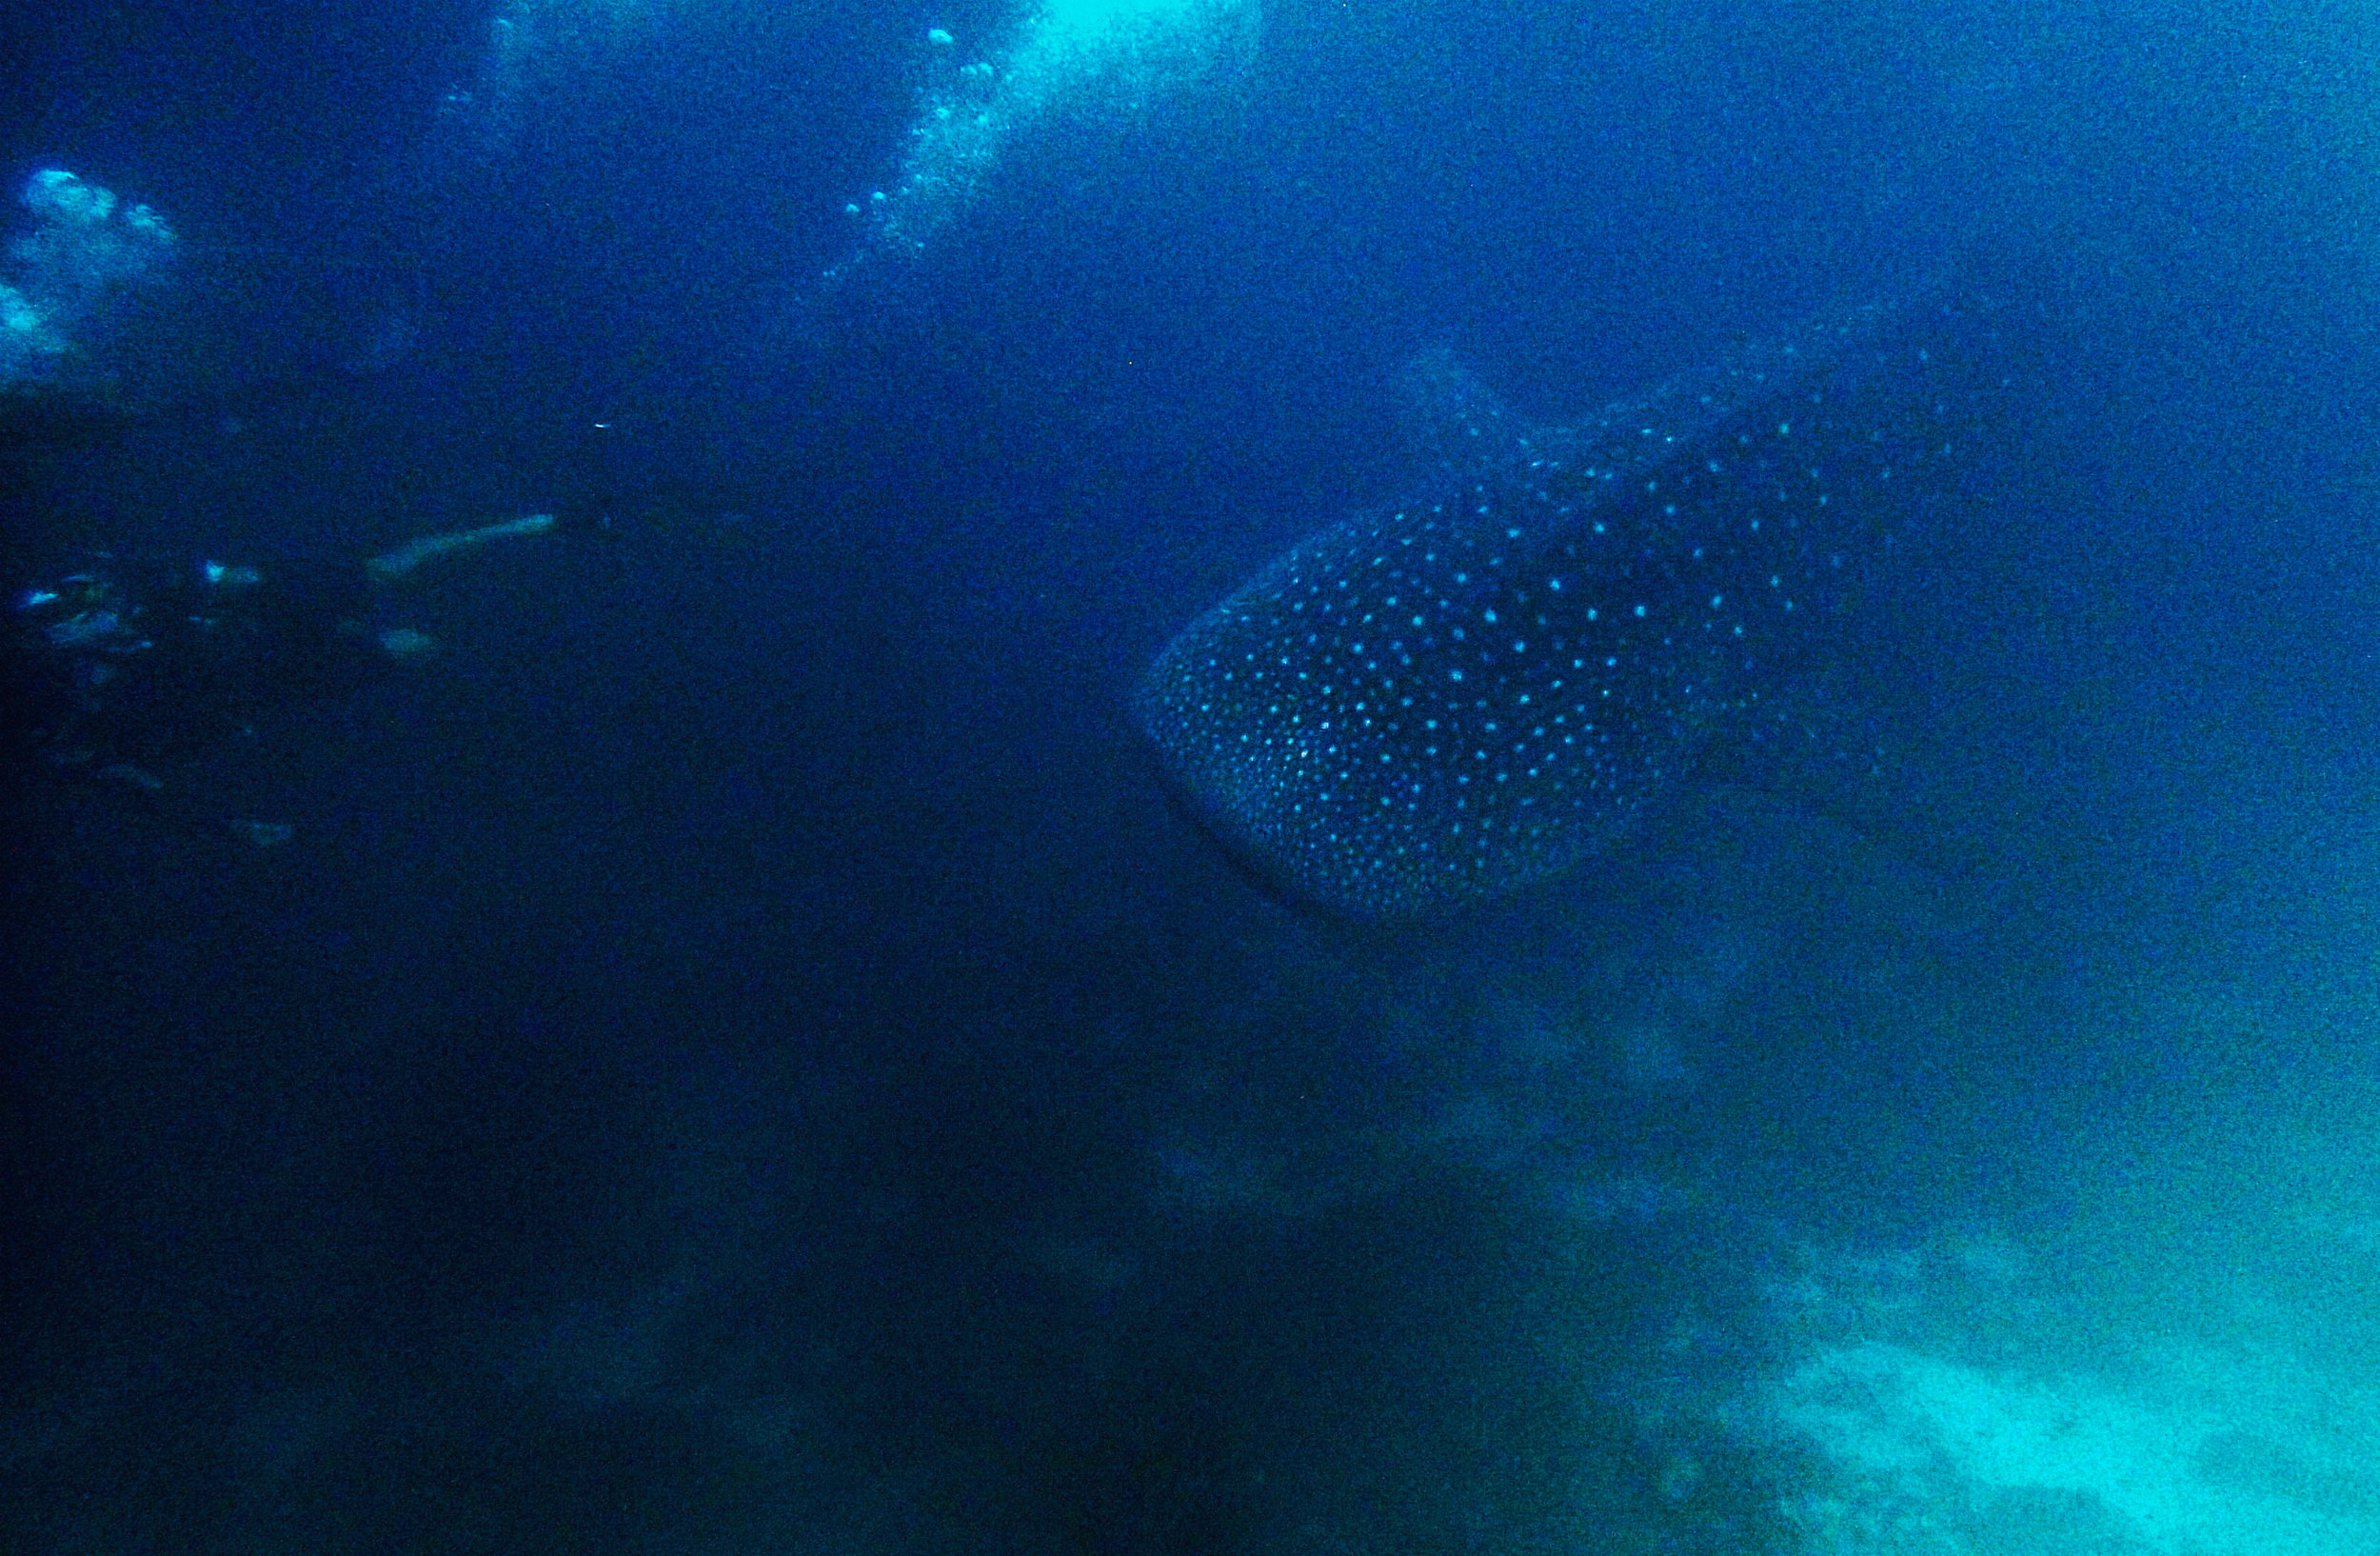 blurry whale shark.jpg